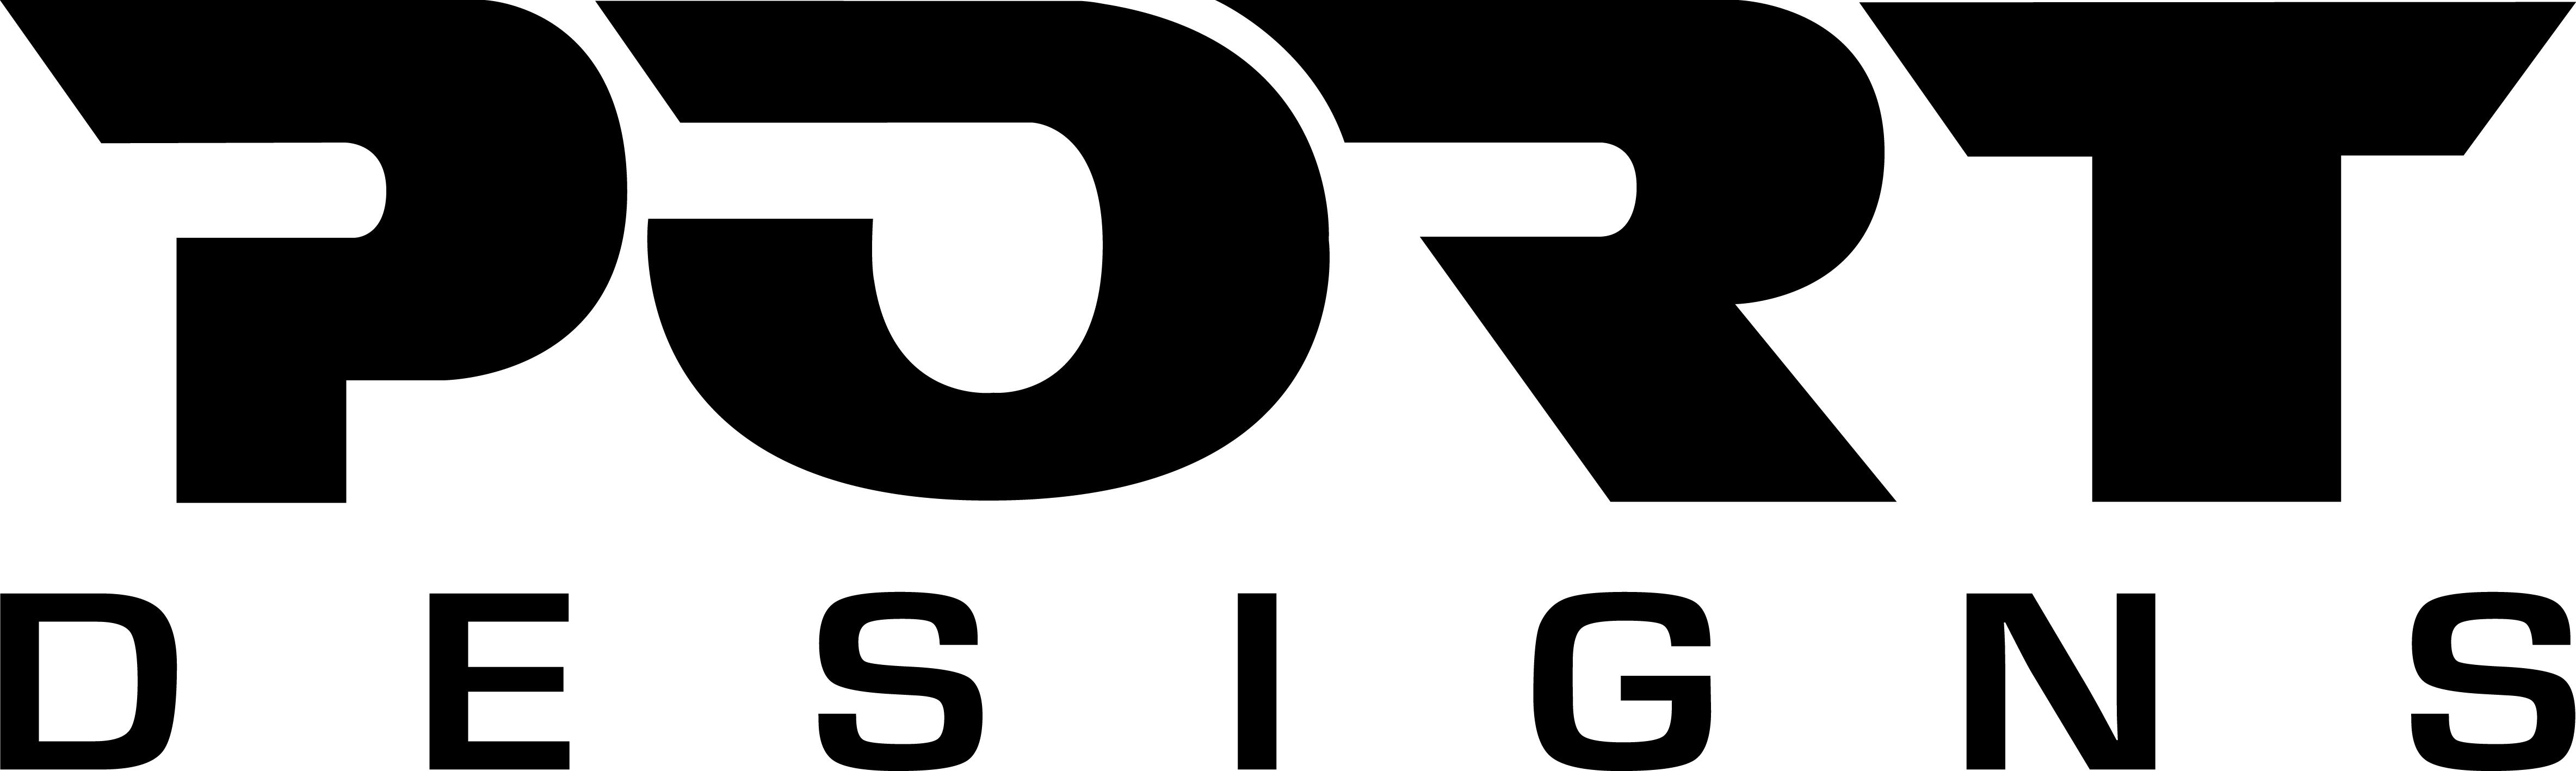 Distree EMEA: Port Designs nagrodzony